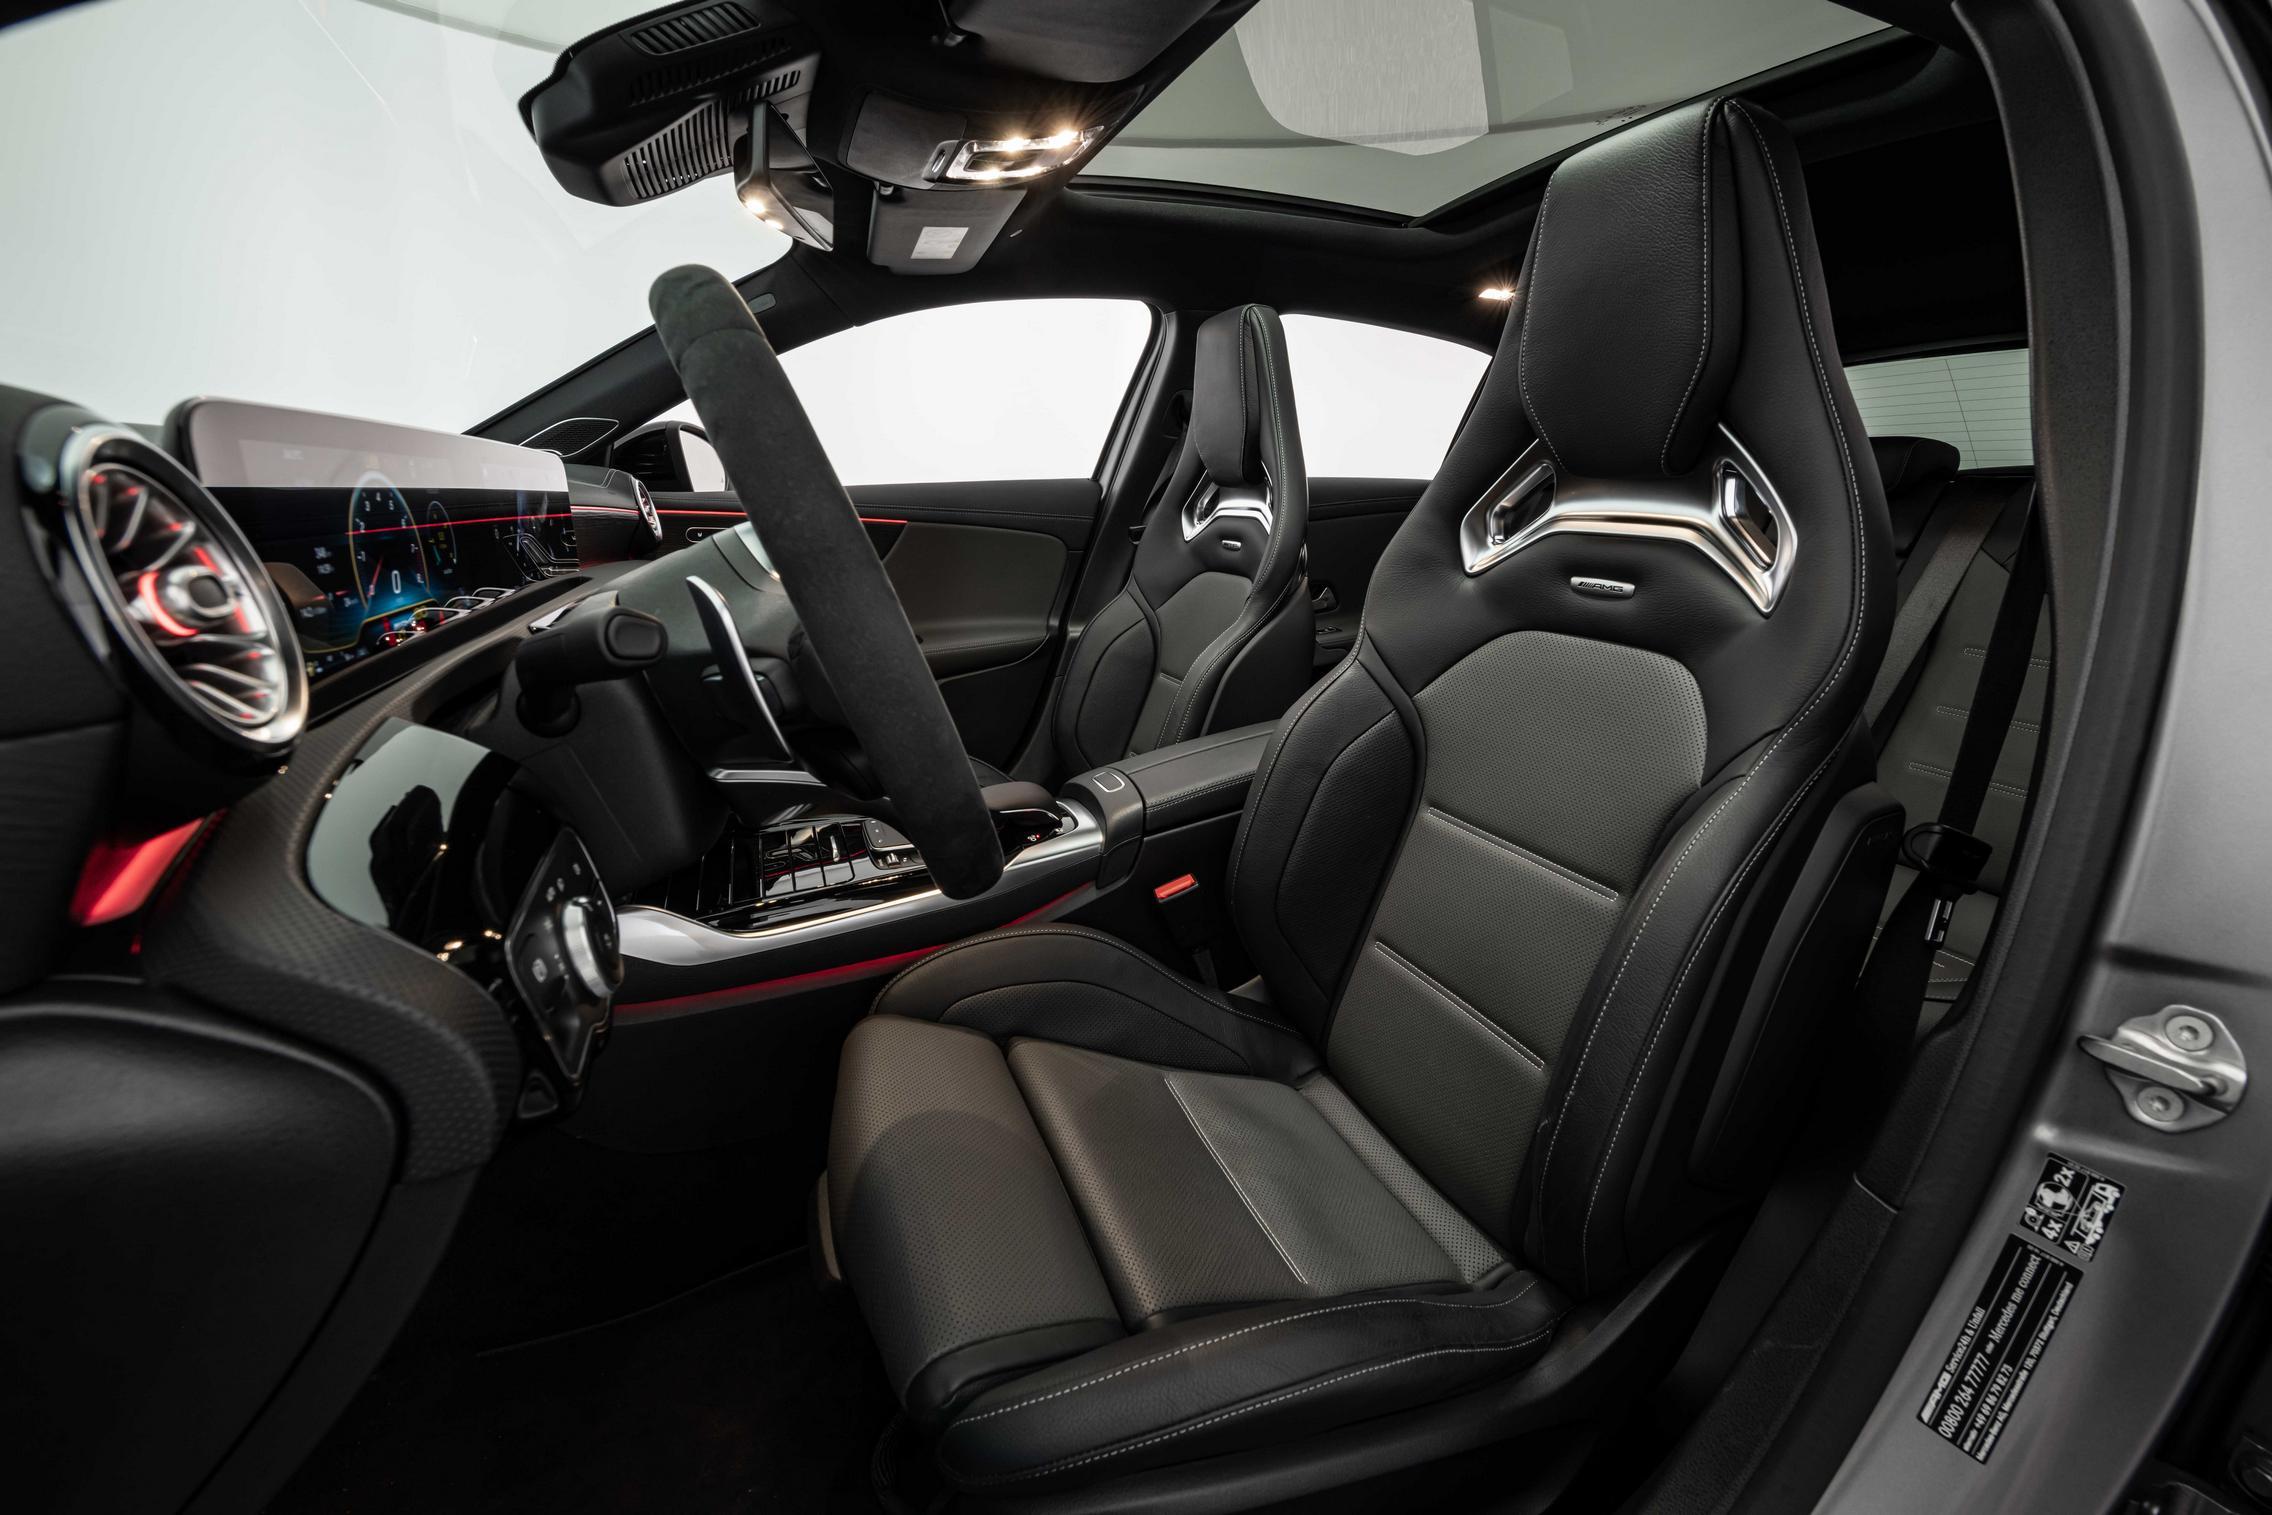 Brabus B45 A45 S AMG interior